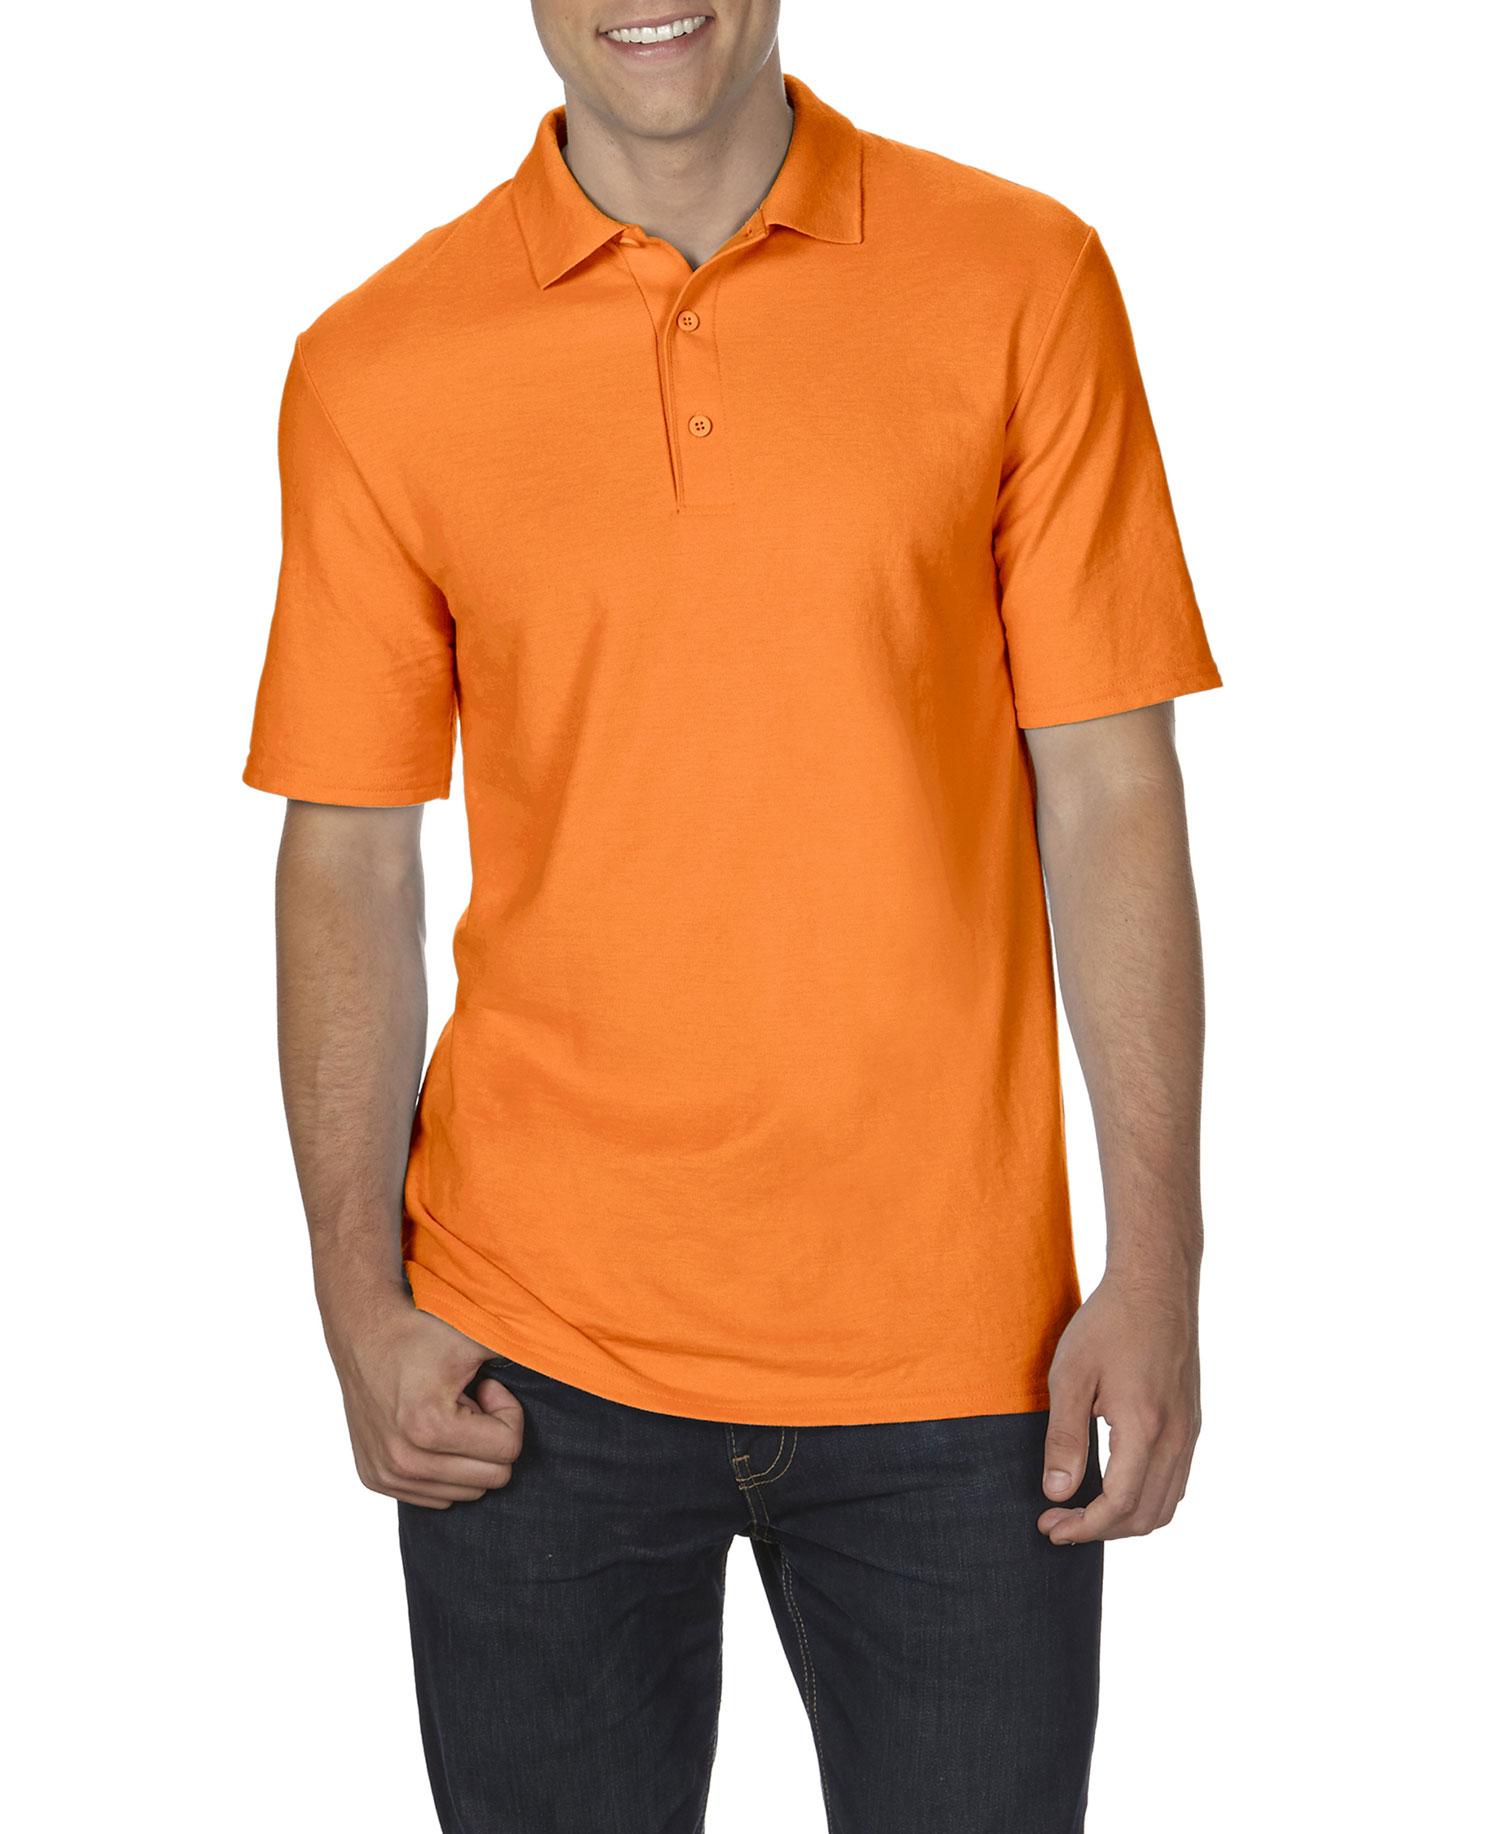 Gildan - G72800 Dryblend Dbl Pq Sportshirt